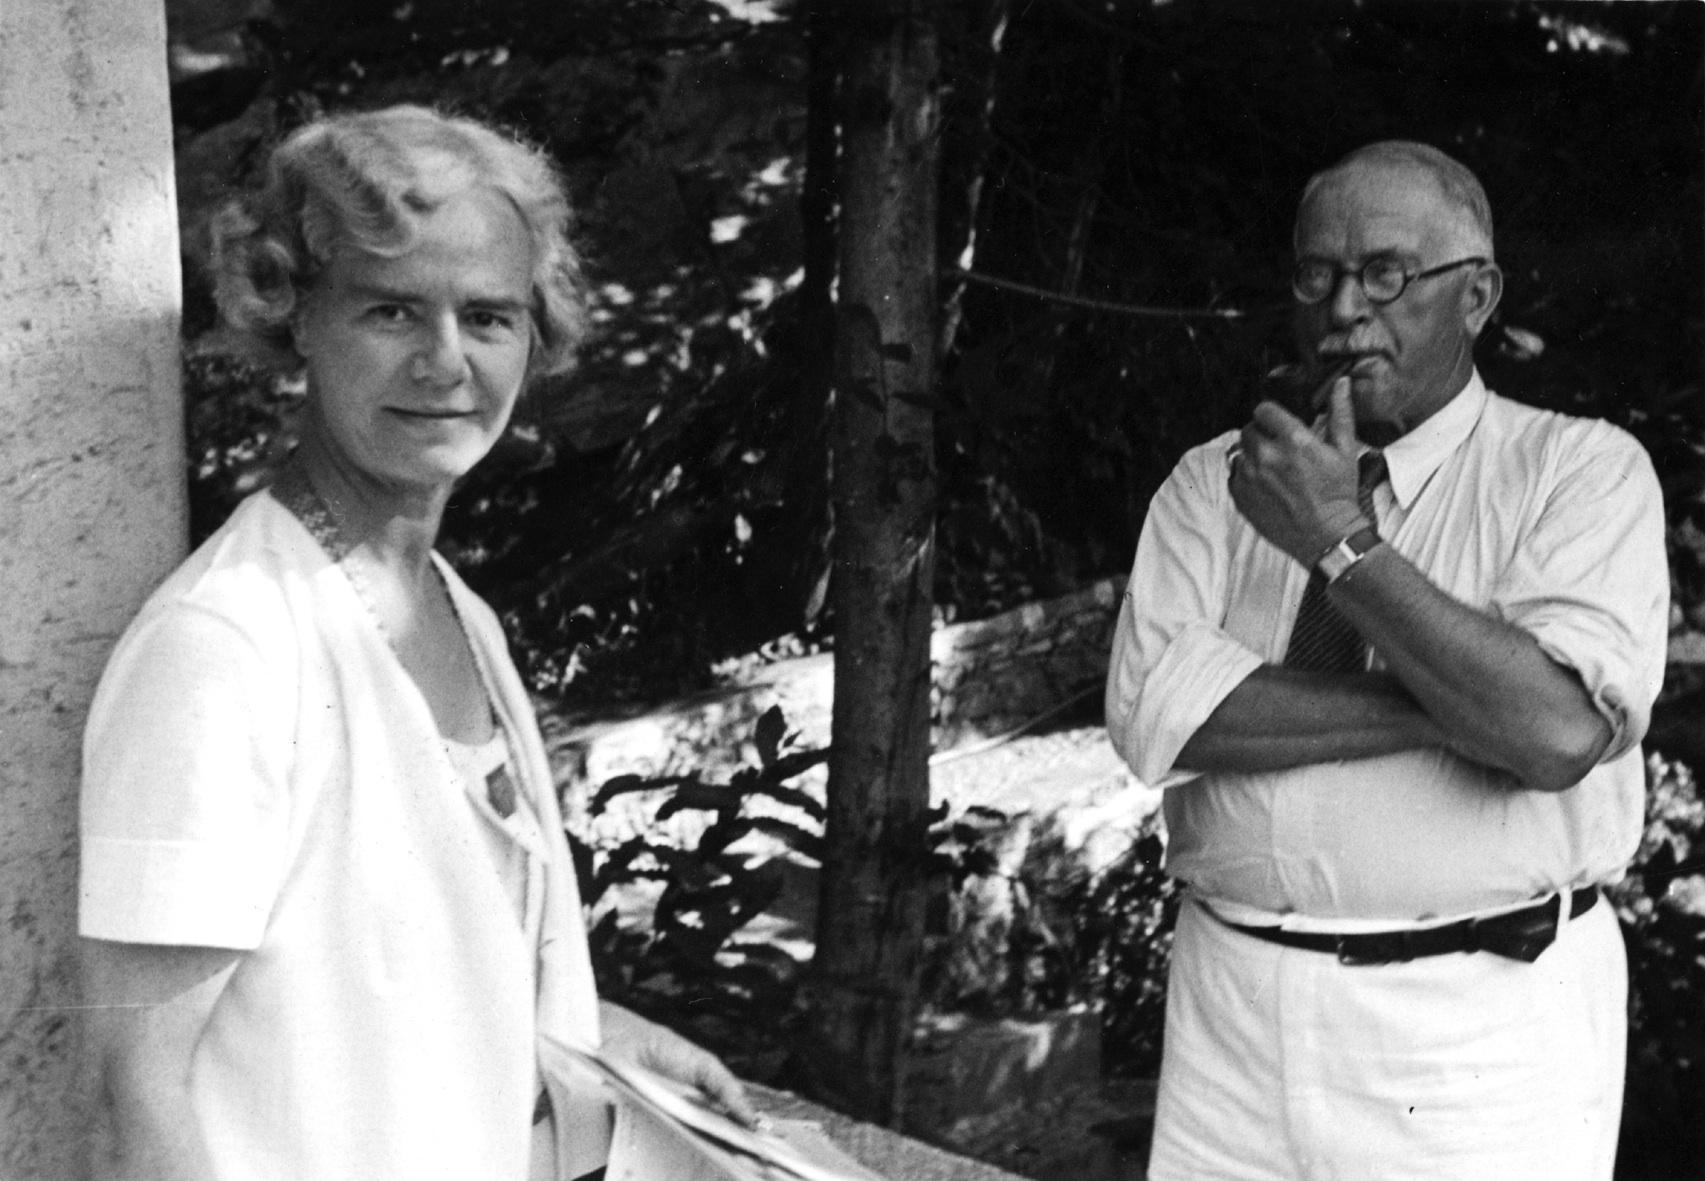 Jung and Olga Fröbe-Kapteyn